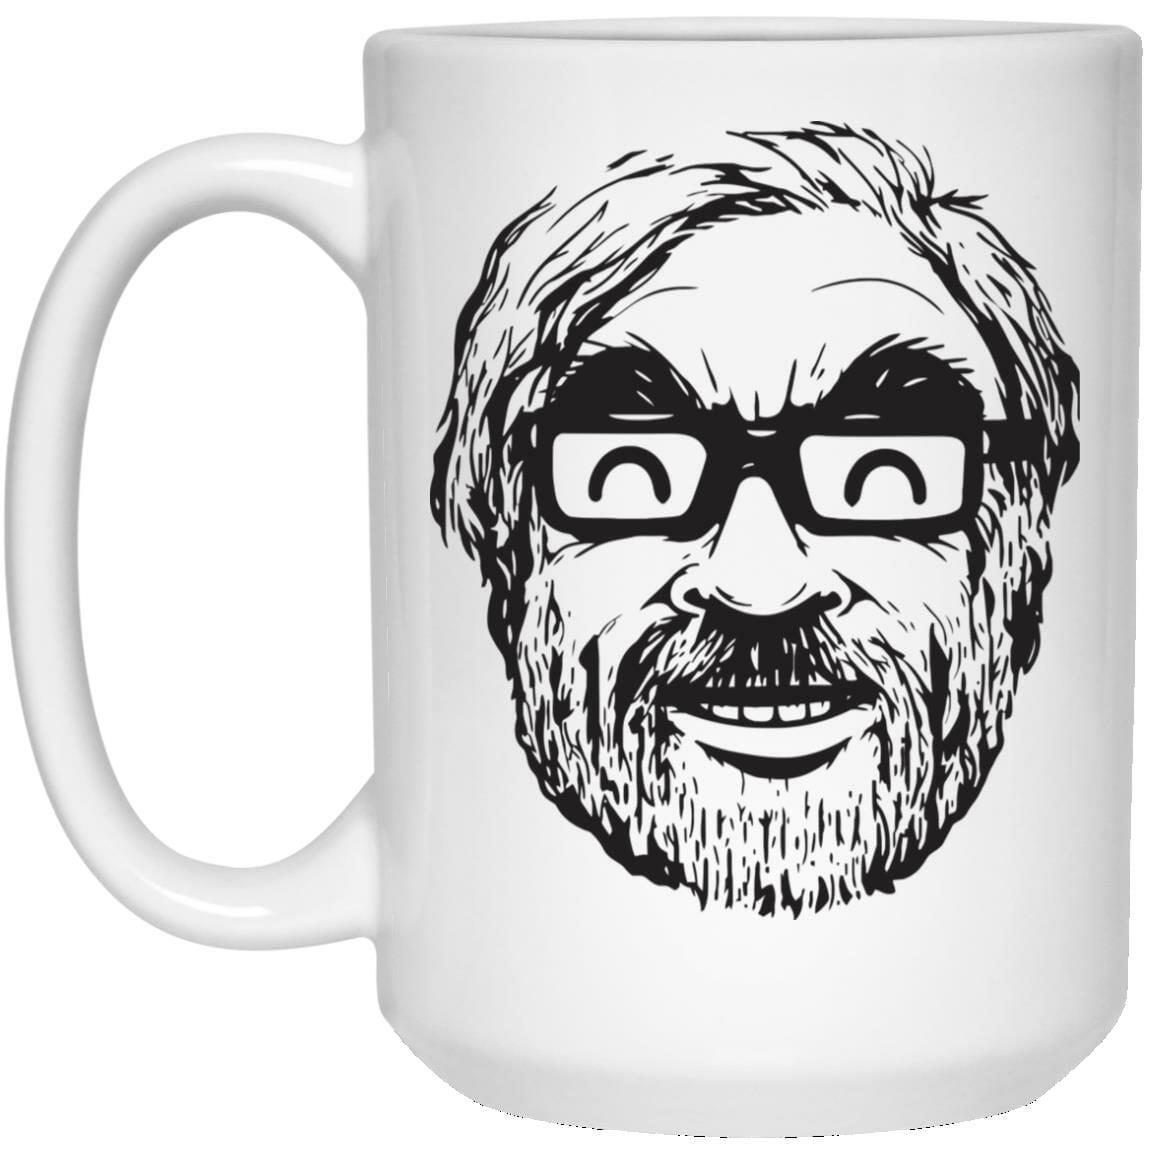 Ghibli Studio – Hayao Miyazaki Portrait Mug